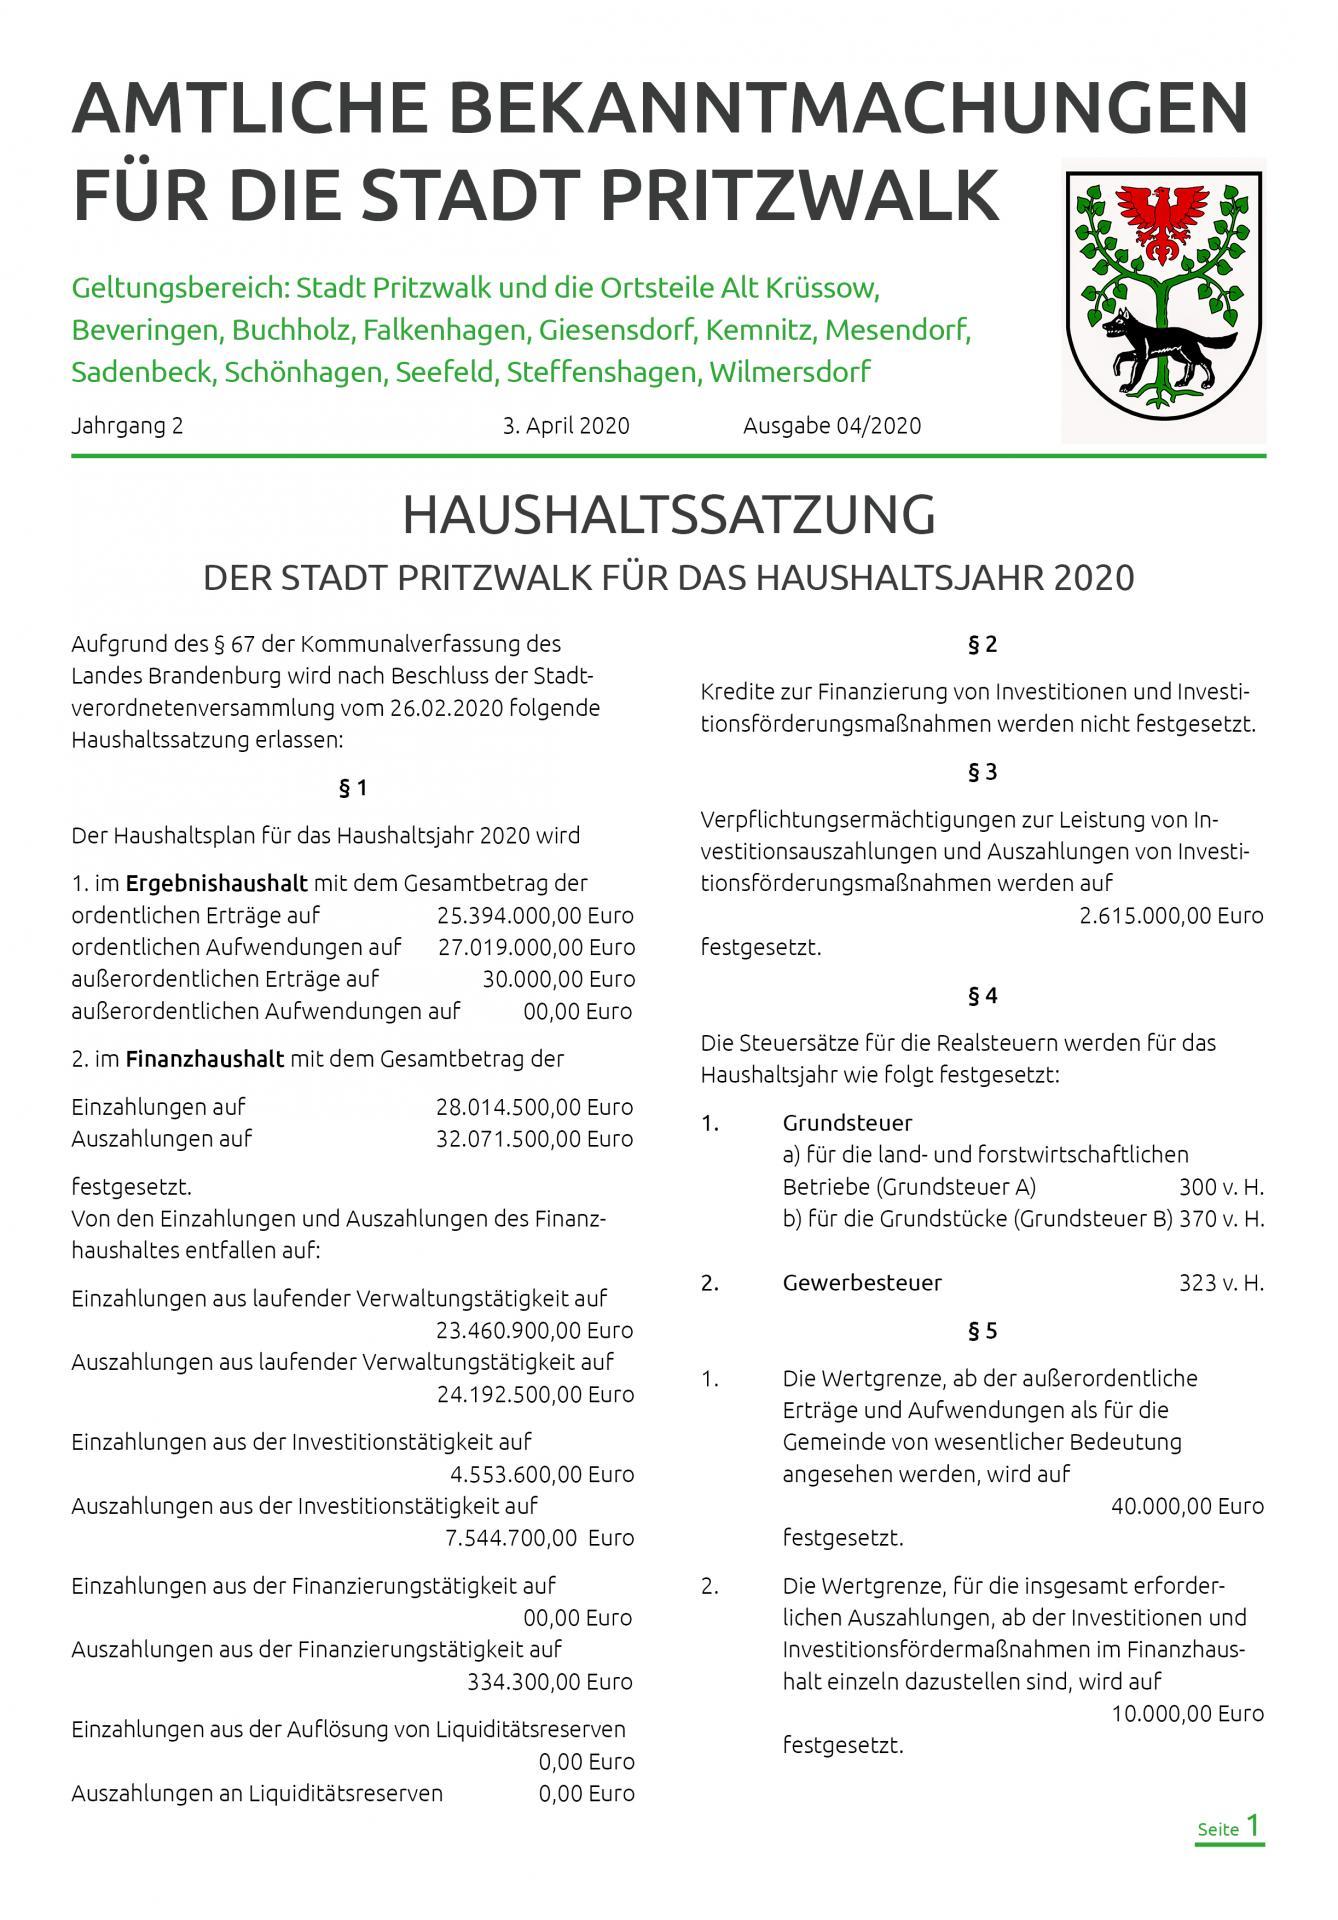 Bekanntmachungen-Heft-4-2020-titel